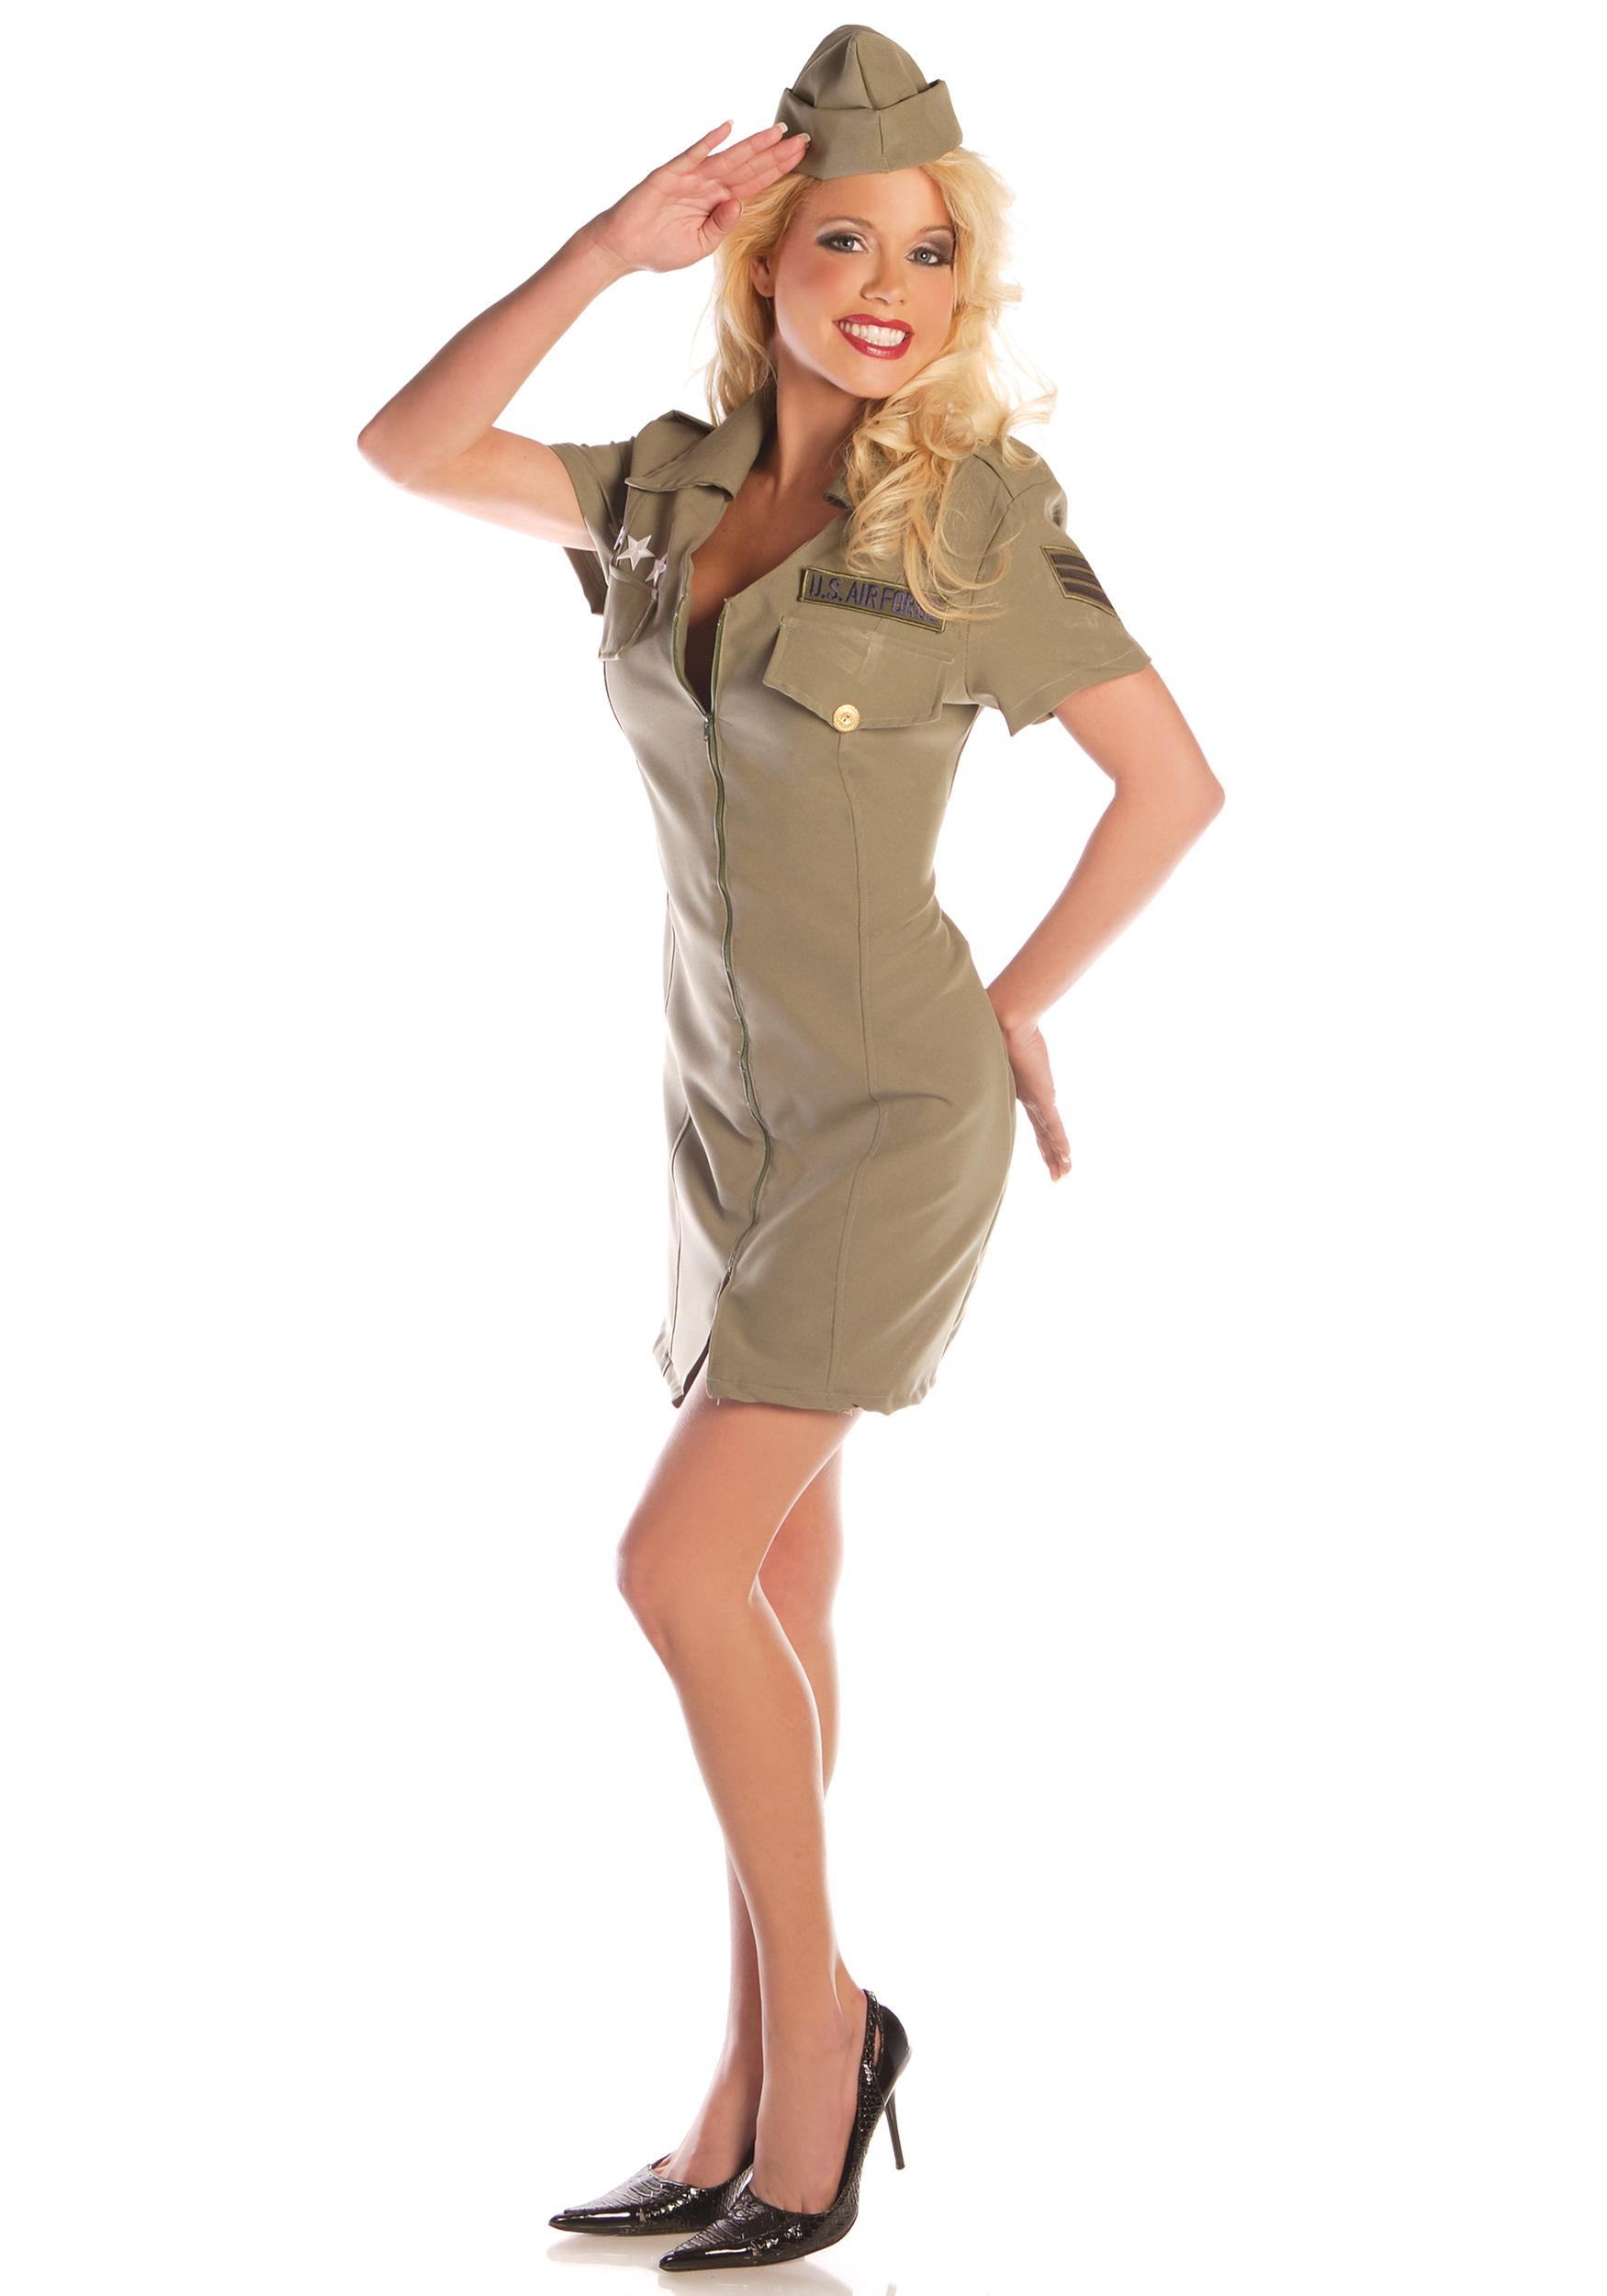 Women In Costumes Hot 42